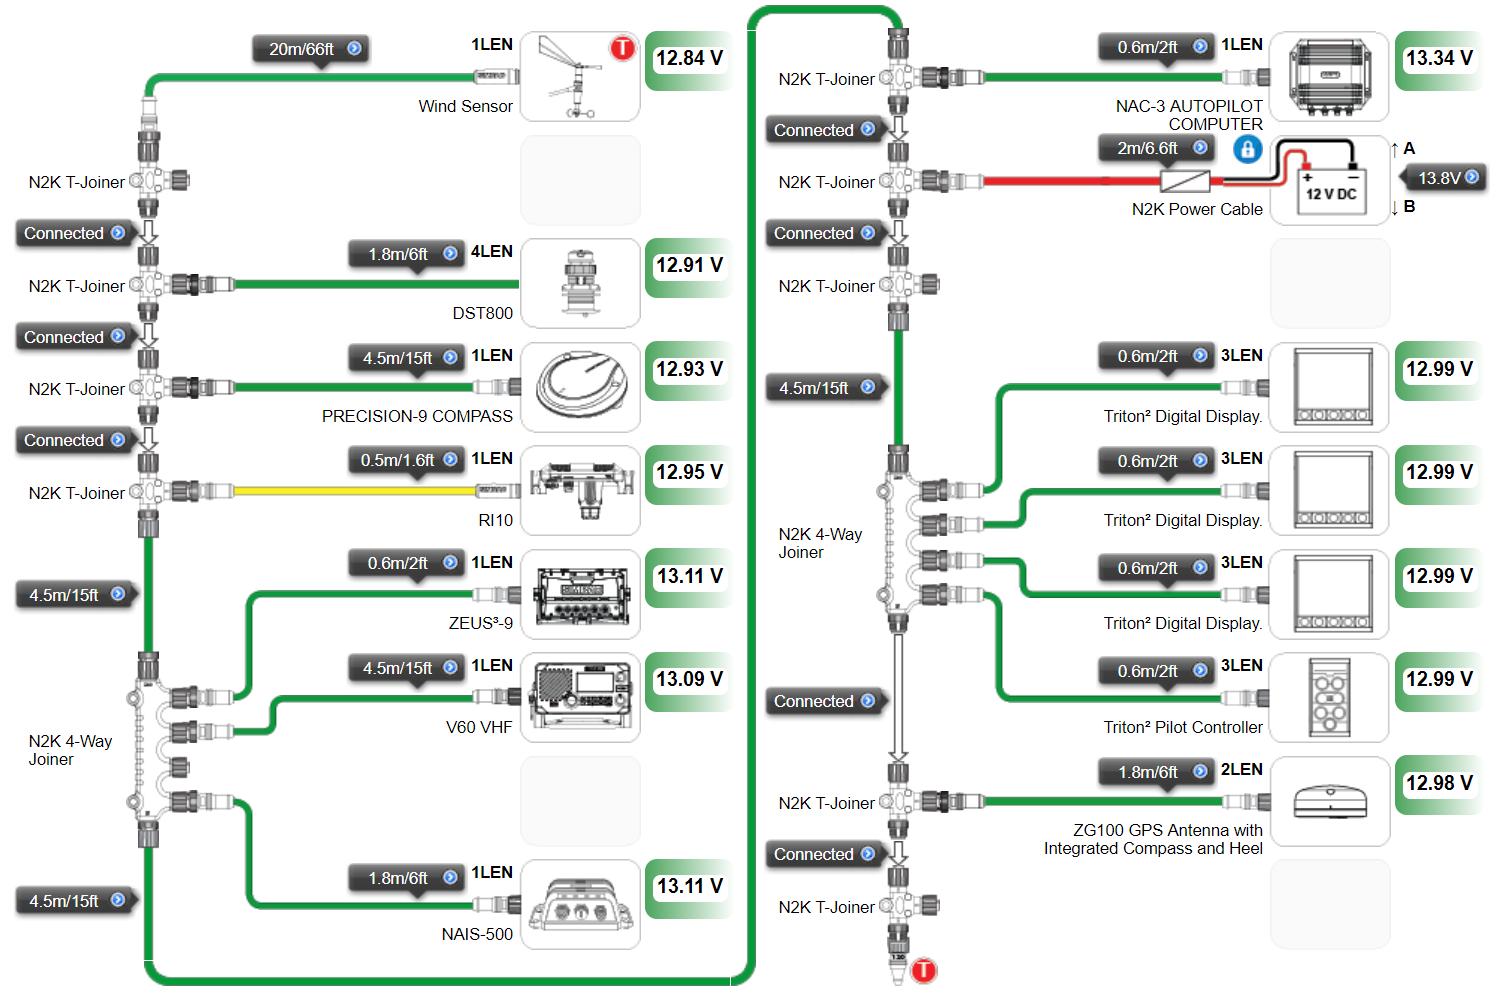 Wiring Diagram Pilot Plug Simrad